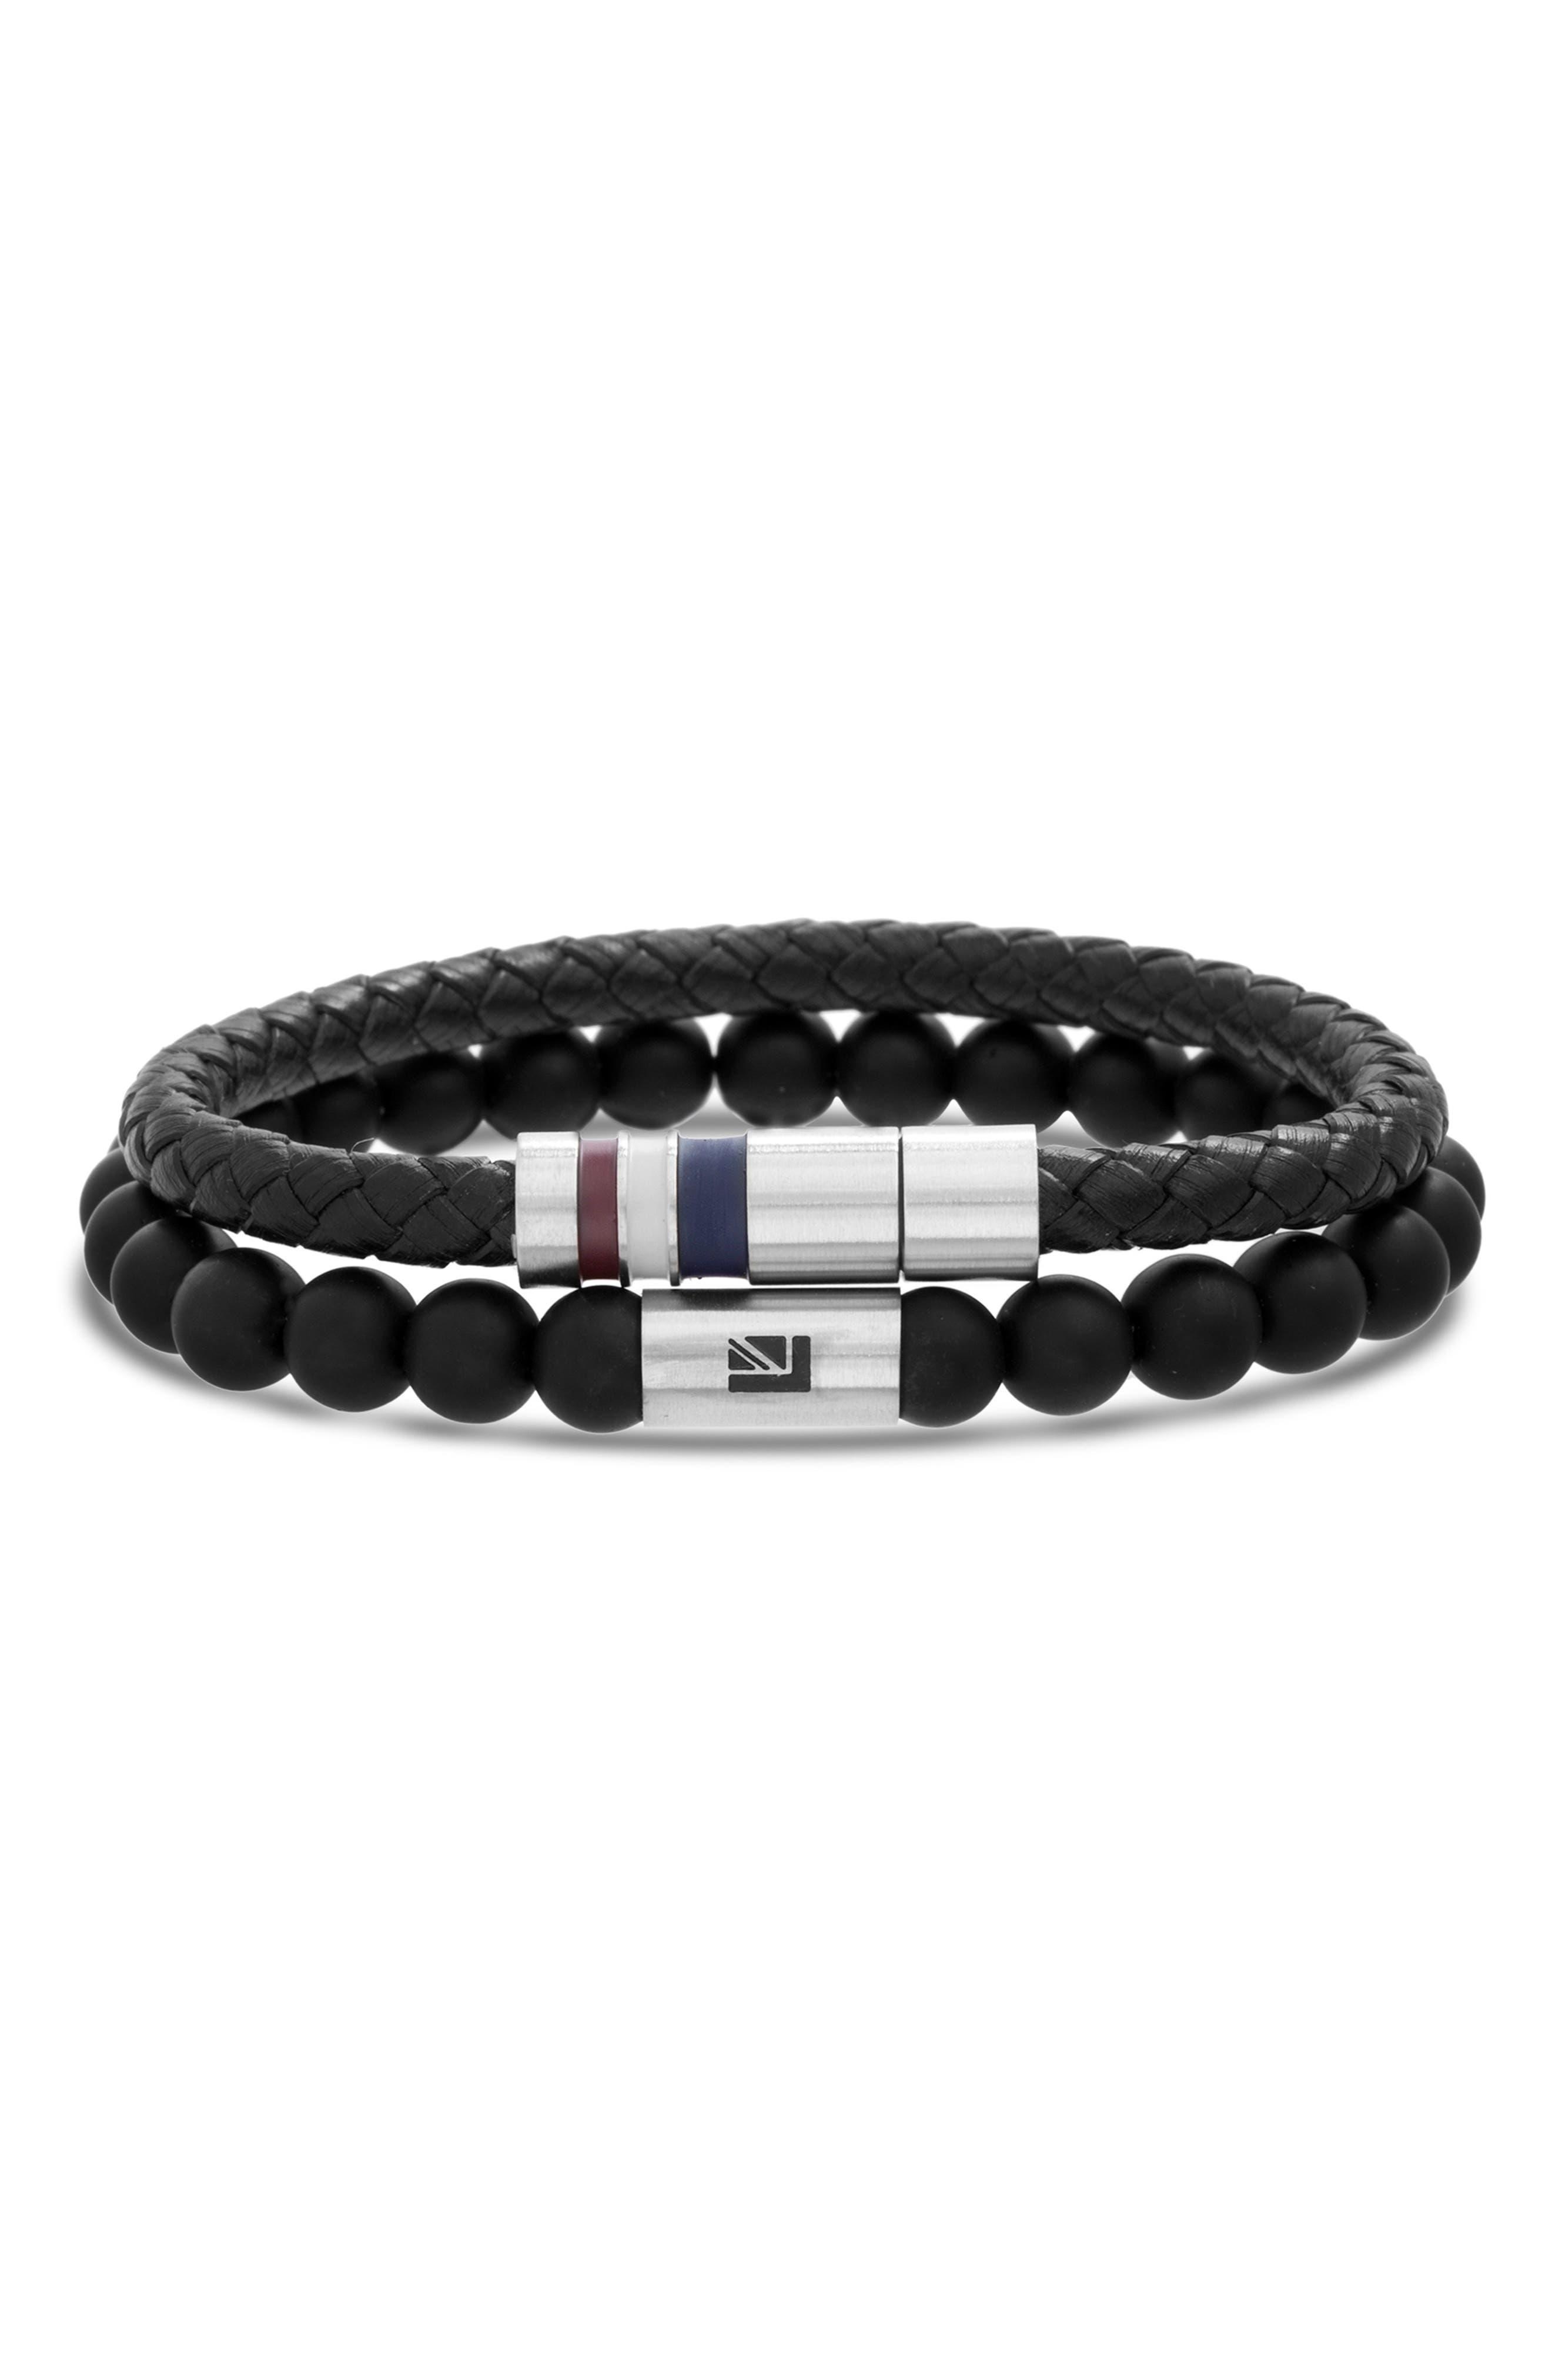 BEN SHERMAN Leather & Bead Bracelet Set, Main, color, BLACK